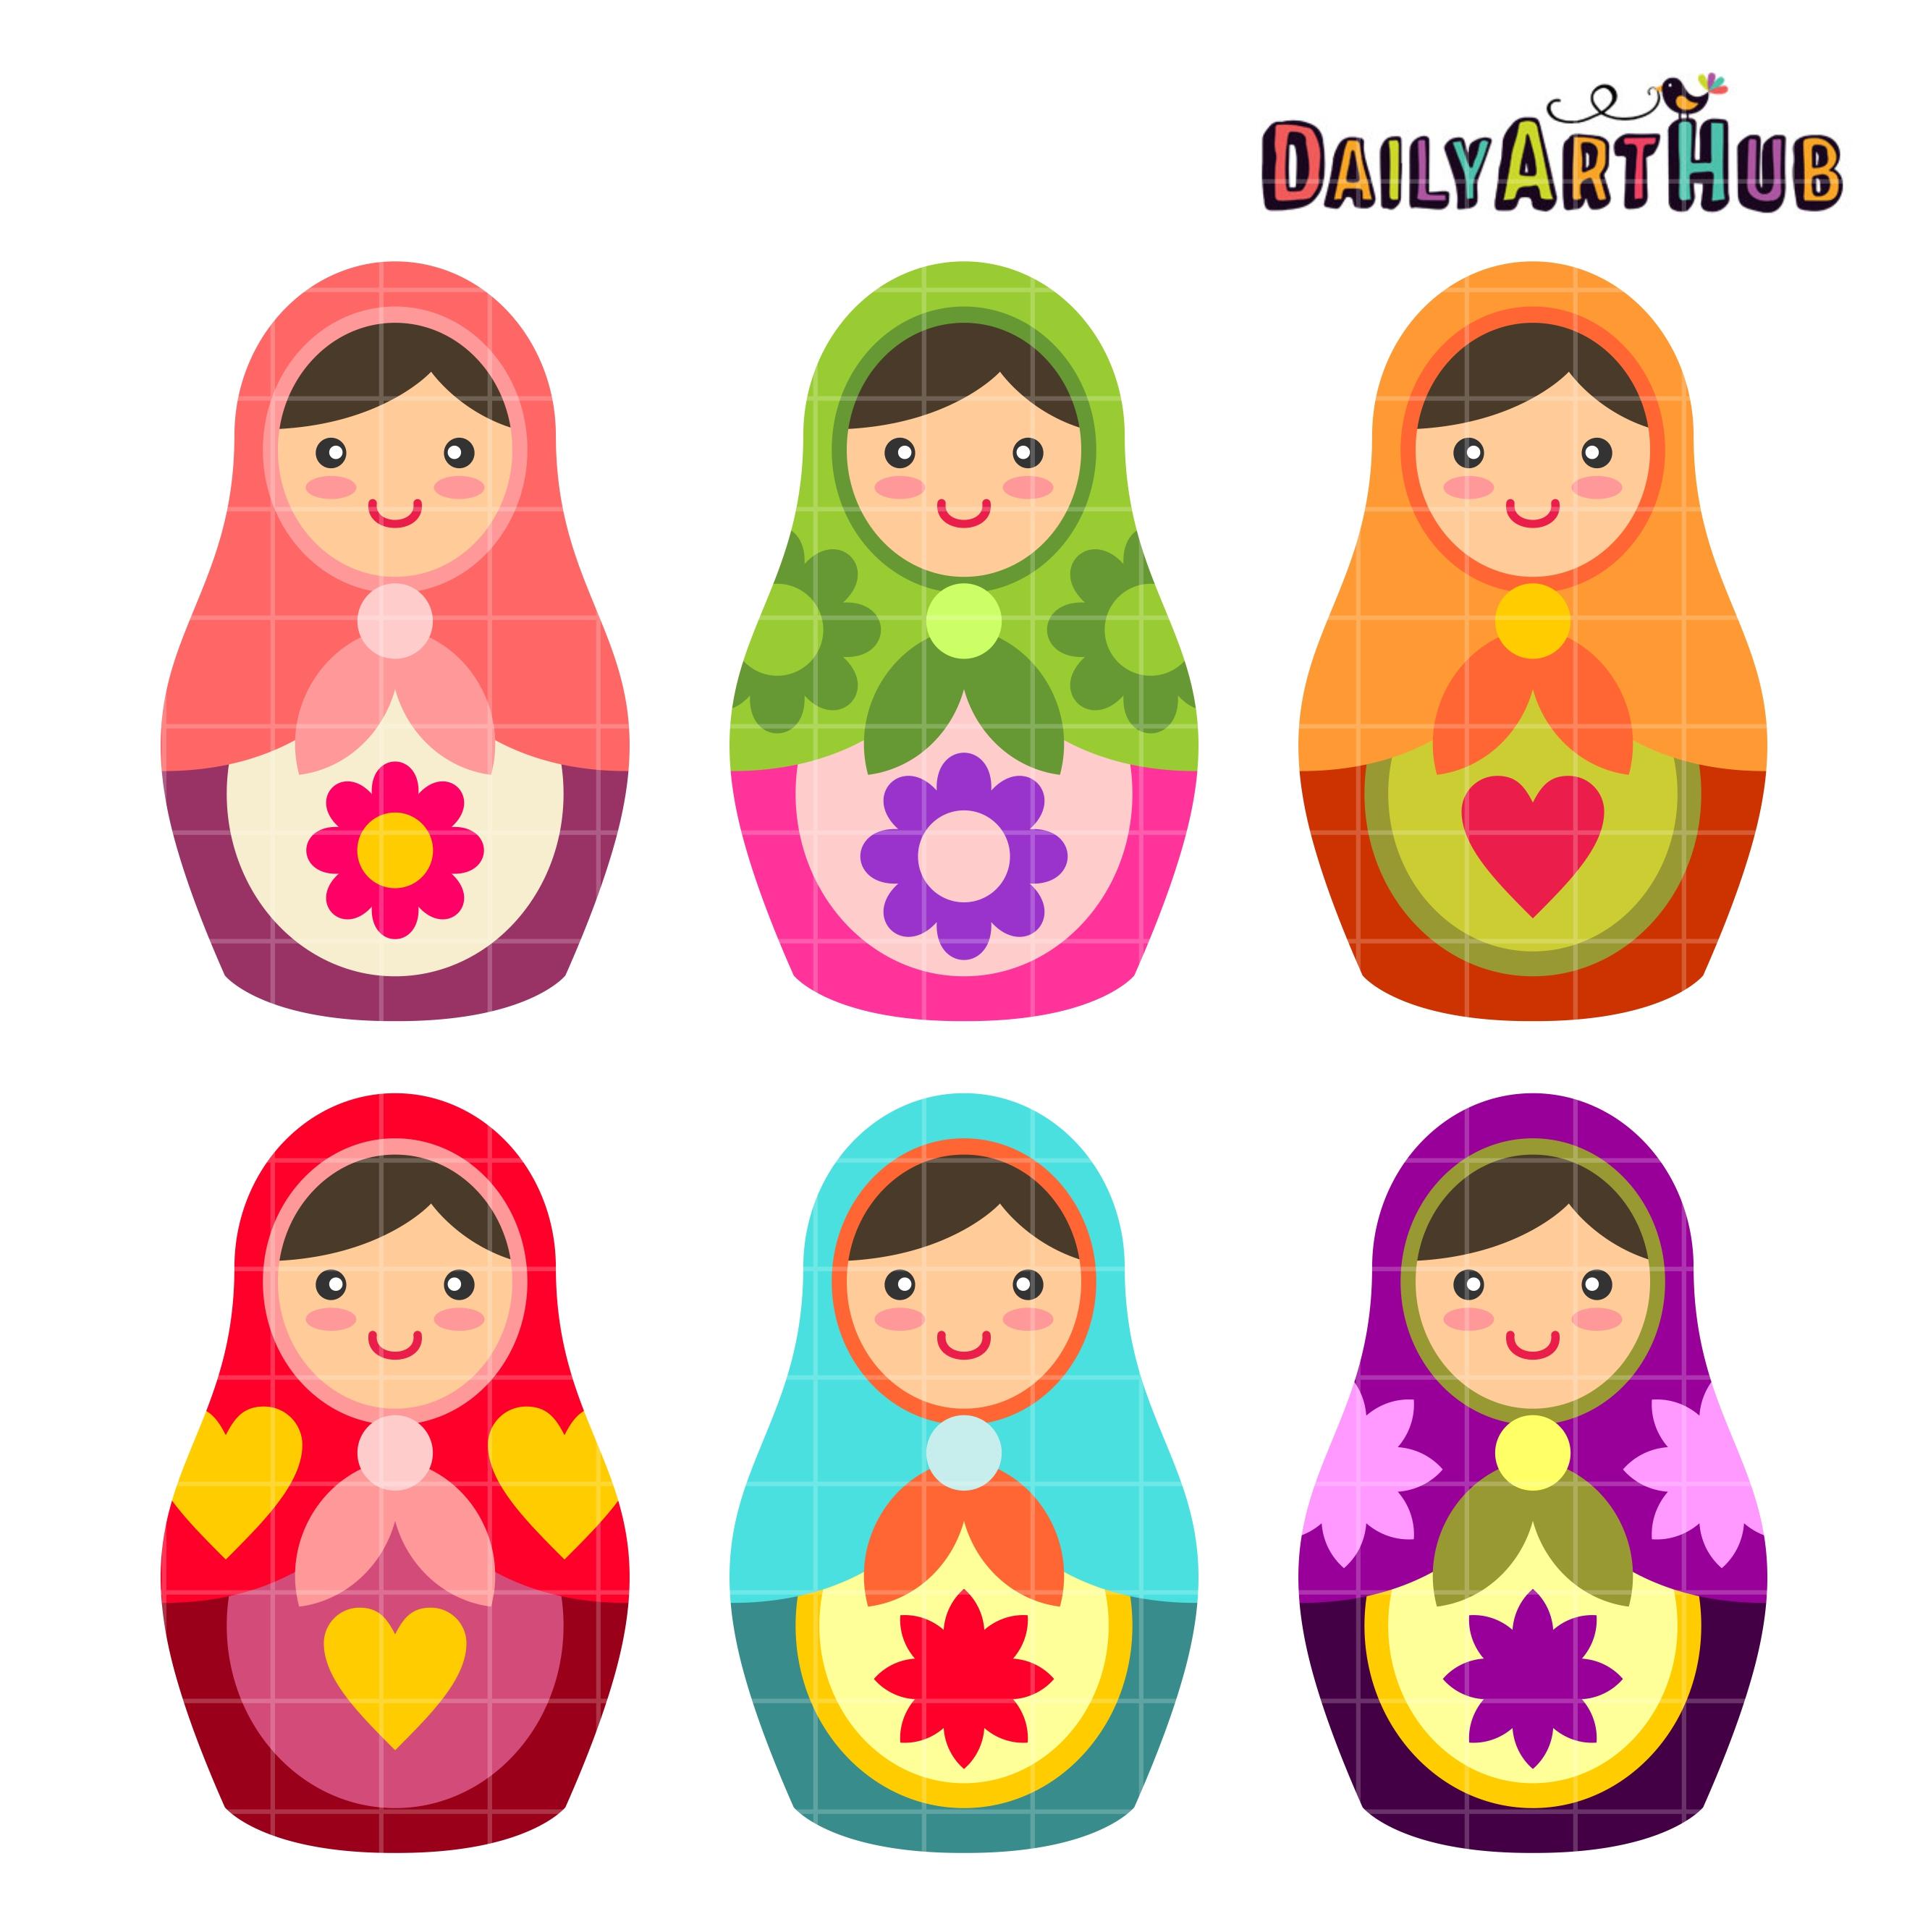 2664x2670 Babushka Dolls Clip Art Set Daily Art Hub Free Clip Art Everyday